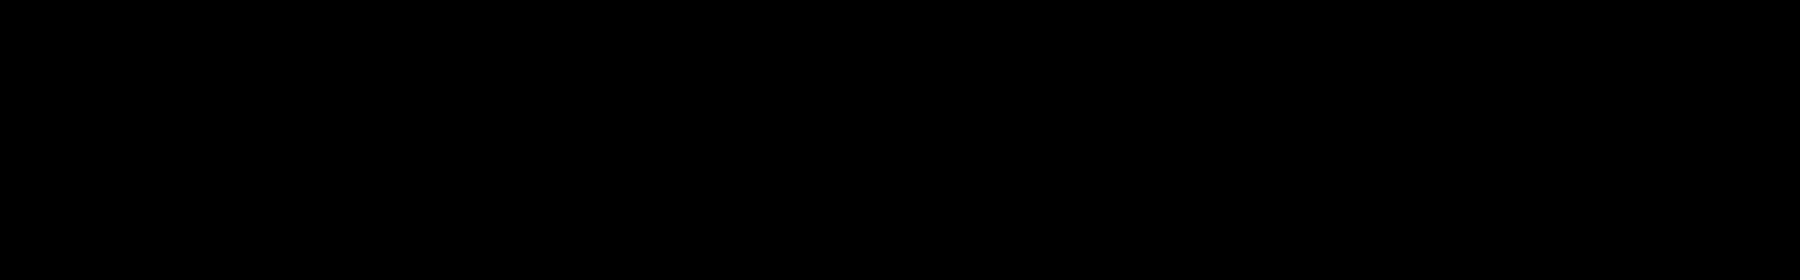 Venus audio waveform